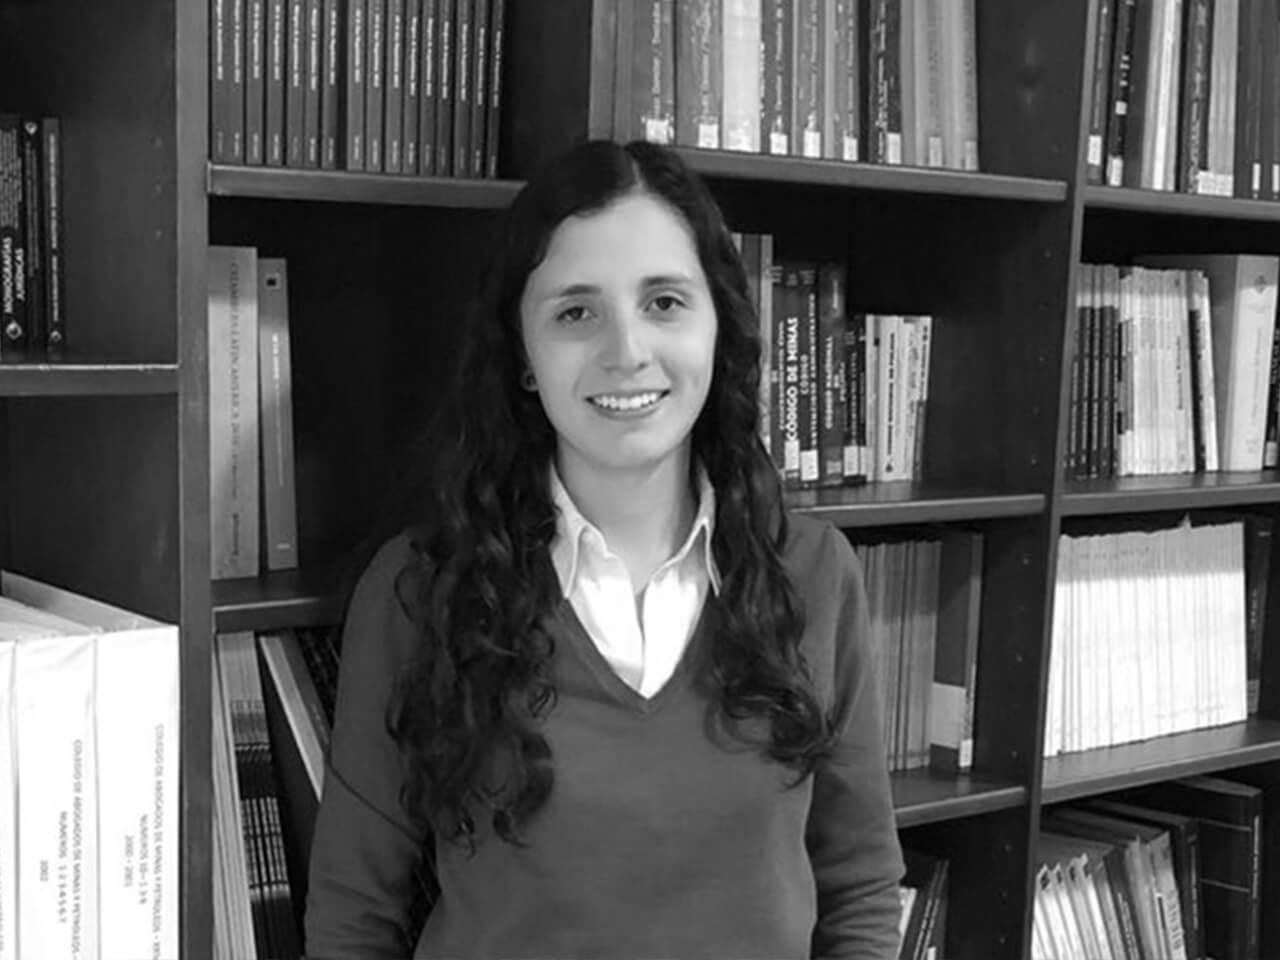 Camila Castiblanco